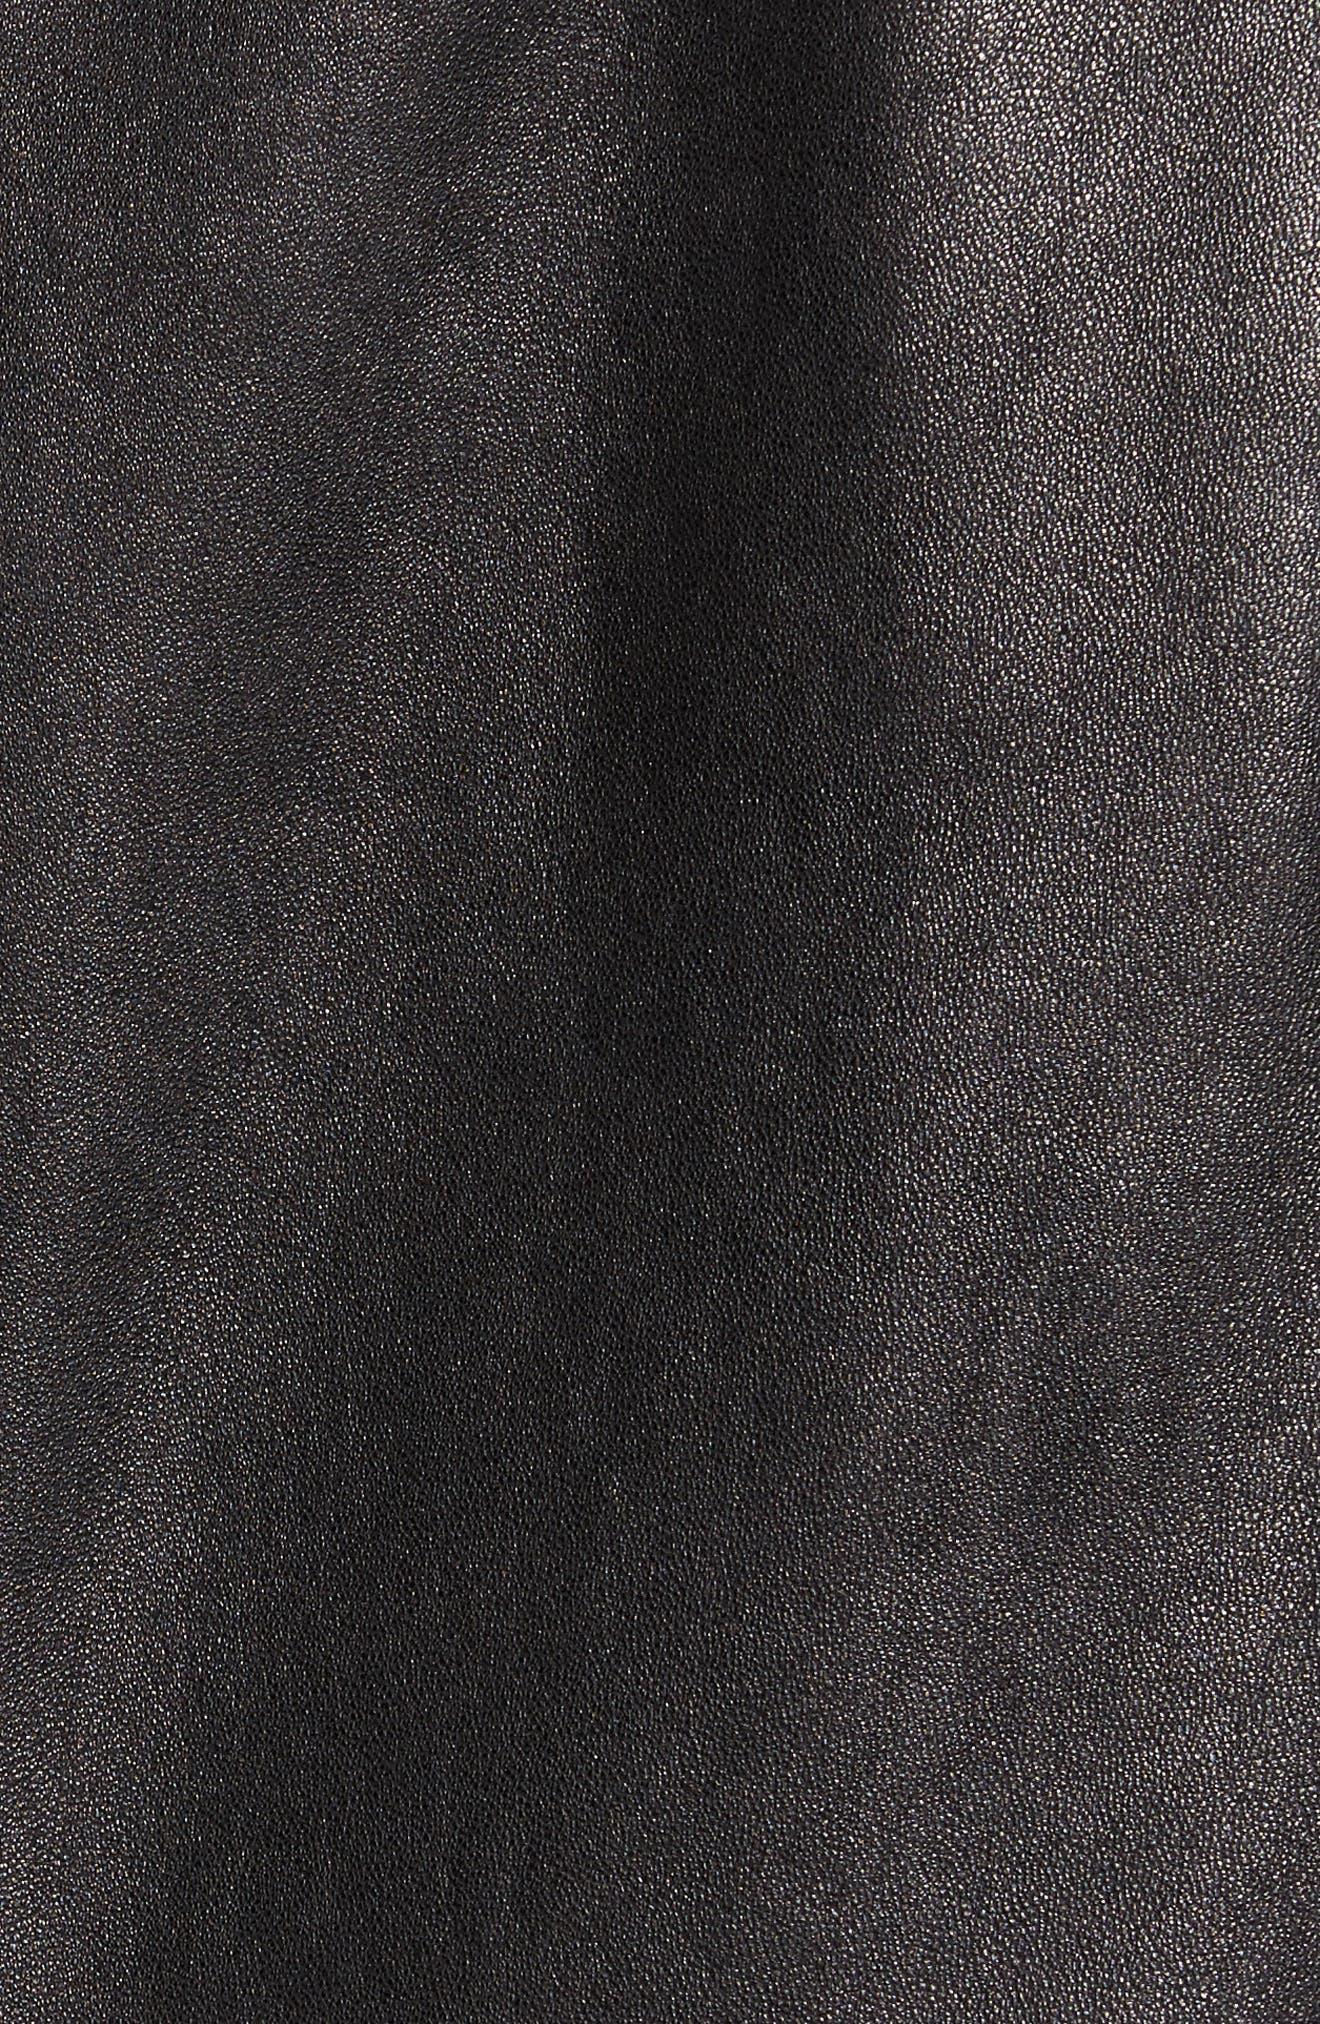 Middlebury Leather Car Coat with Genuine Rabbit Fur Trim,                             Alternate thumbnail 7, color,                             001